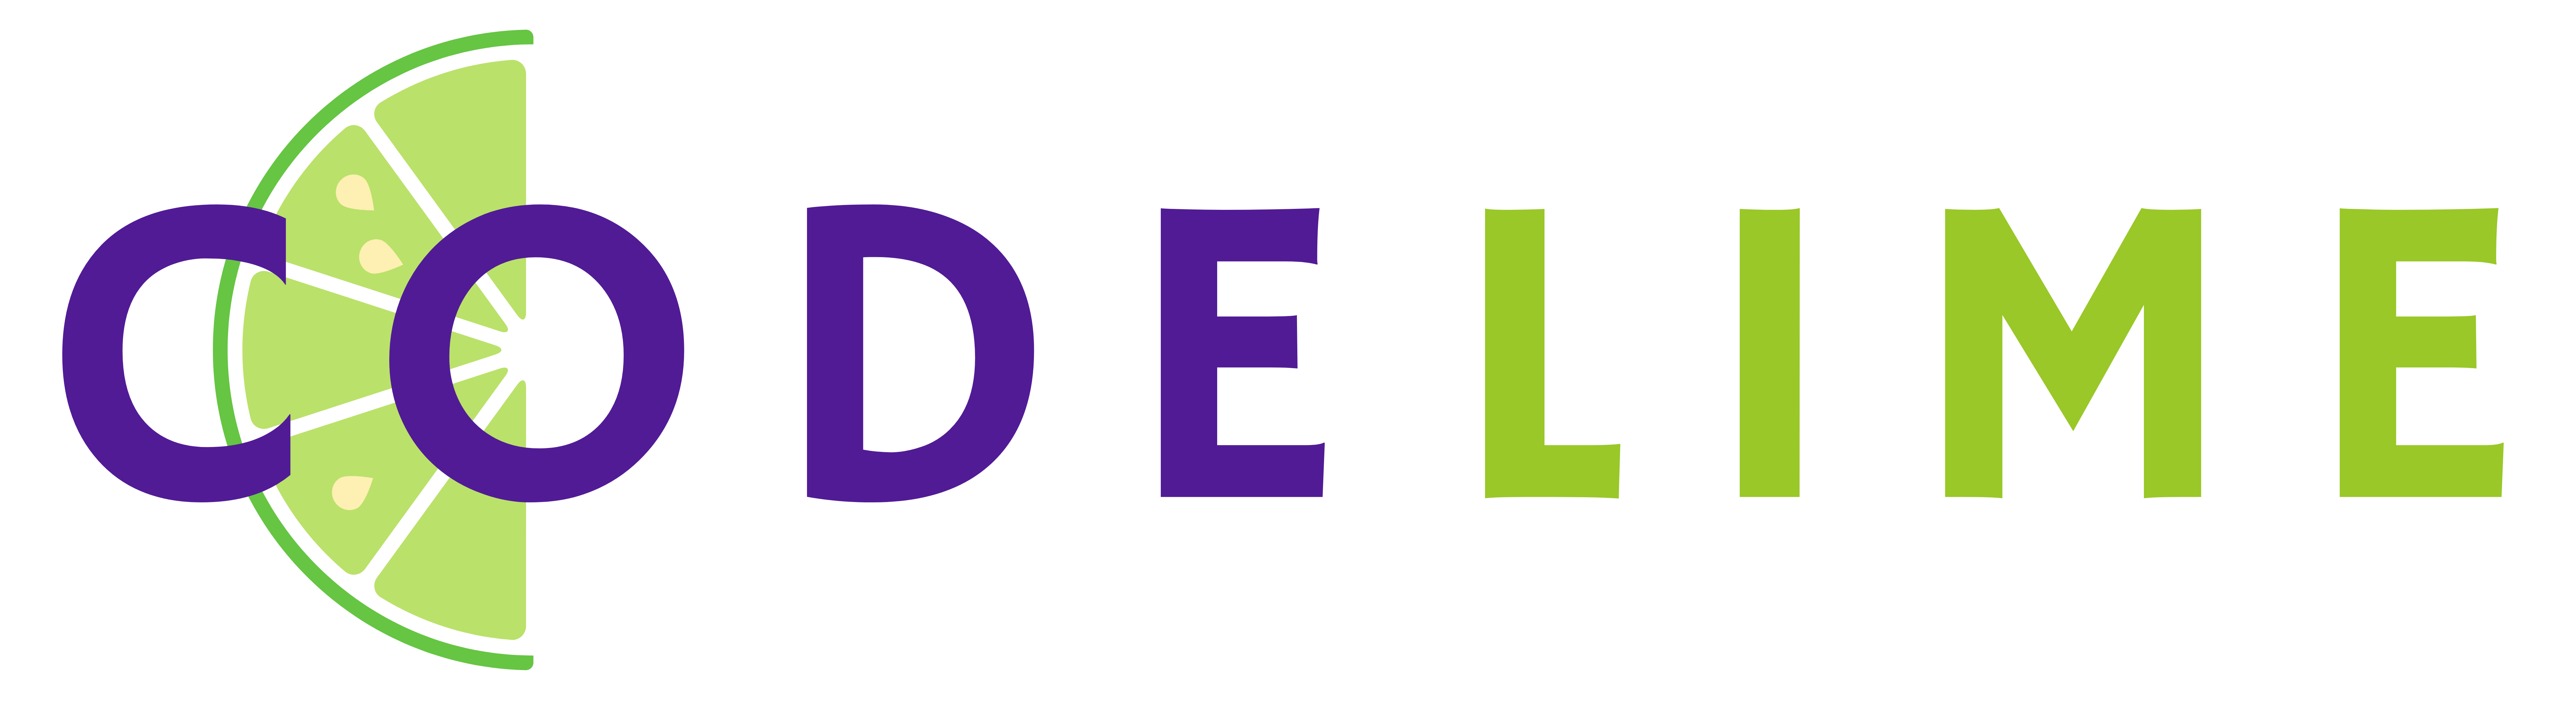 Codelime logo